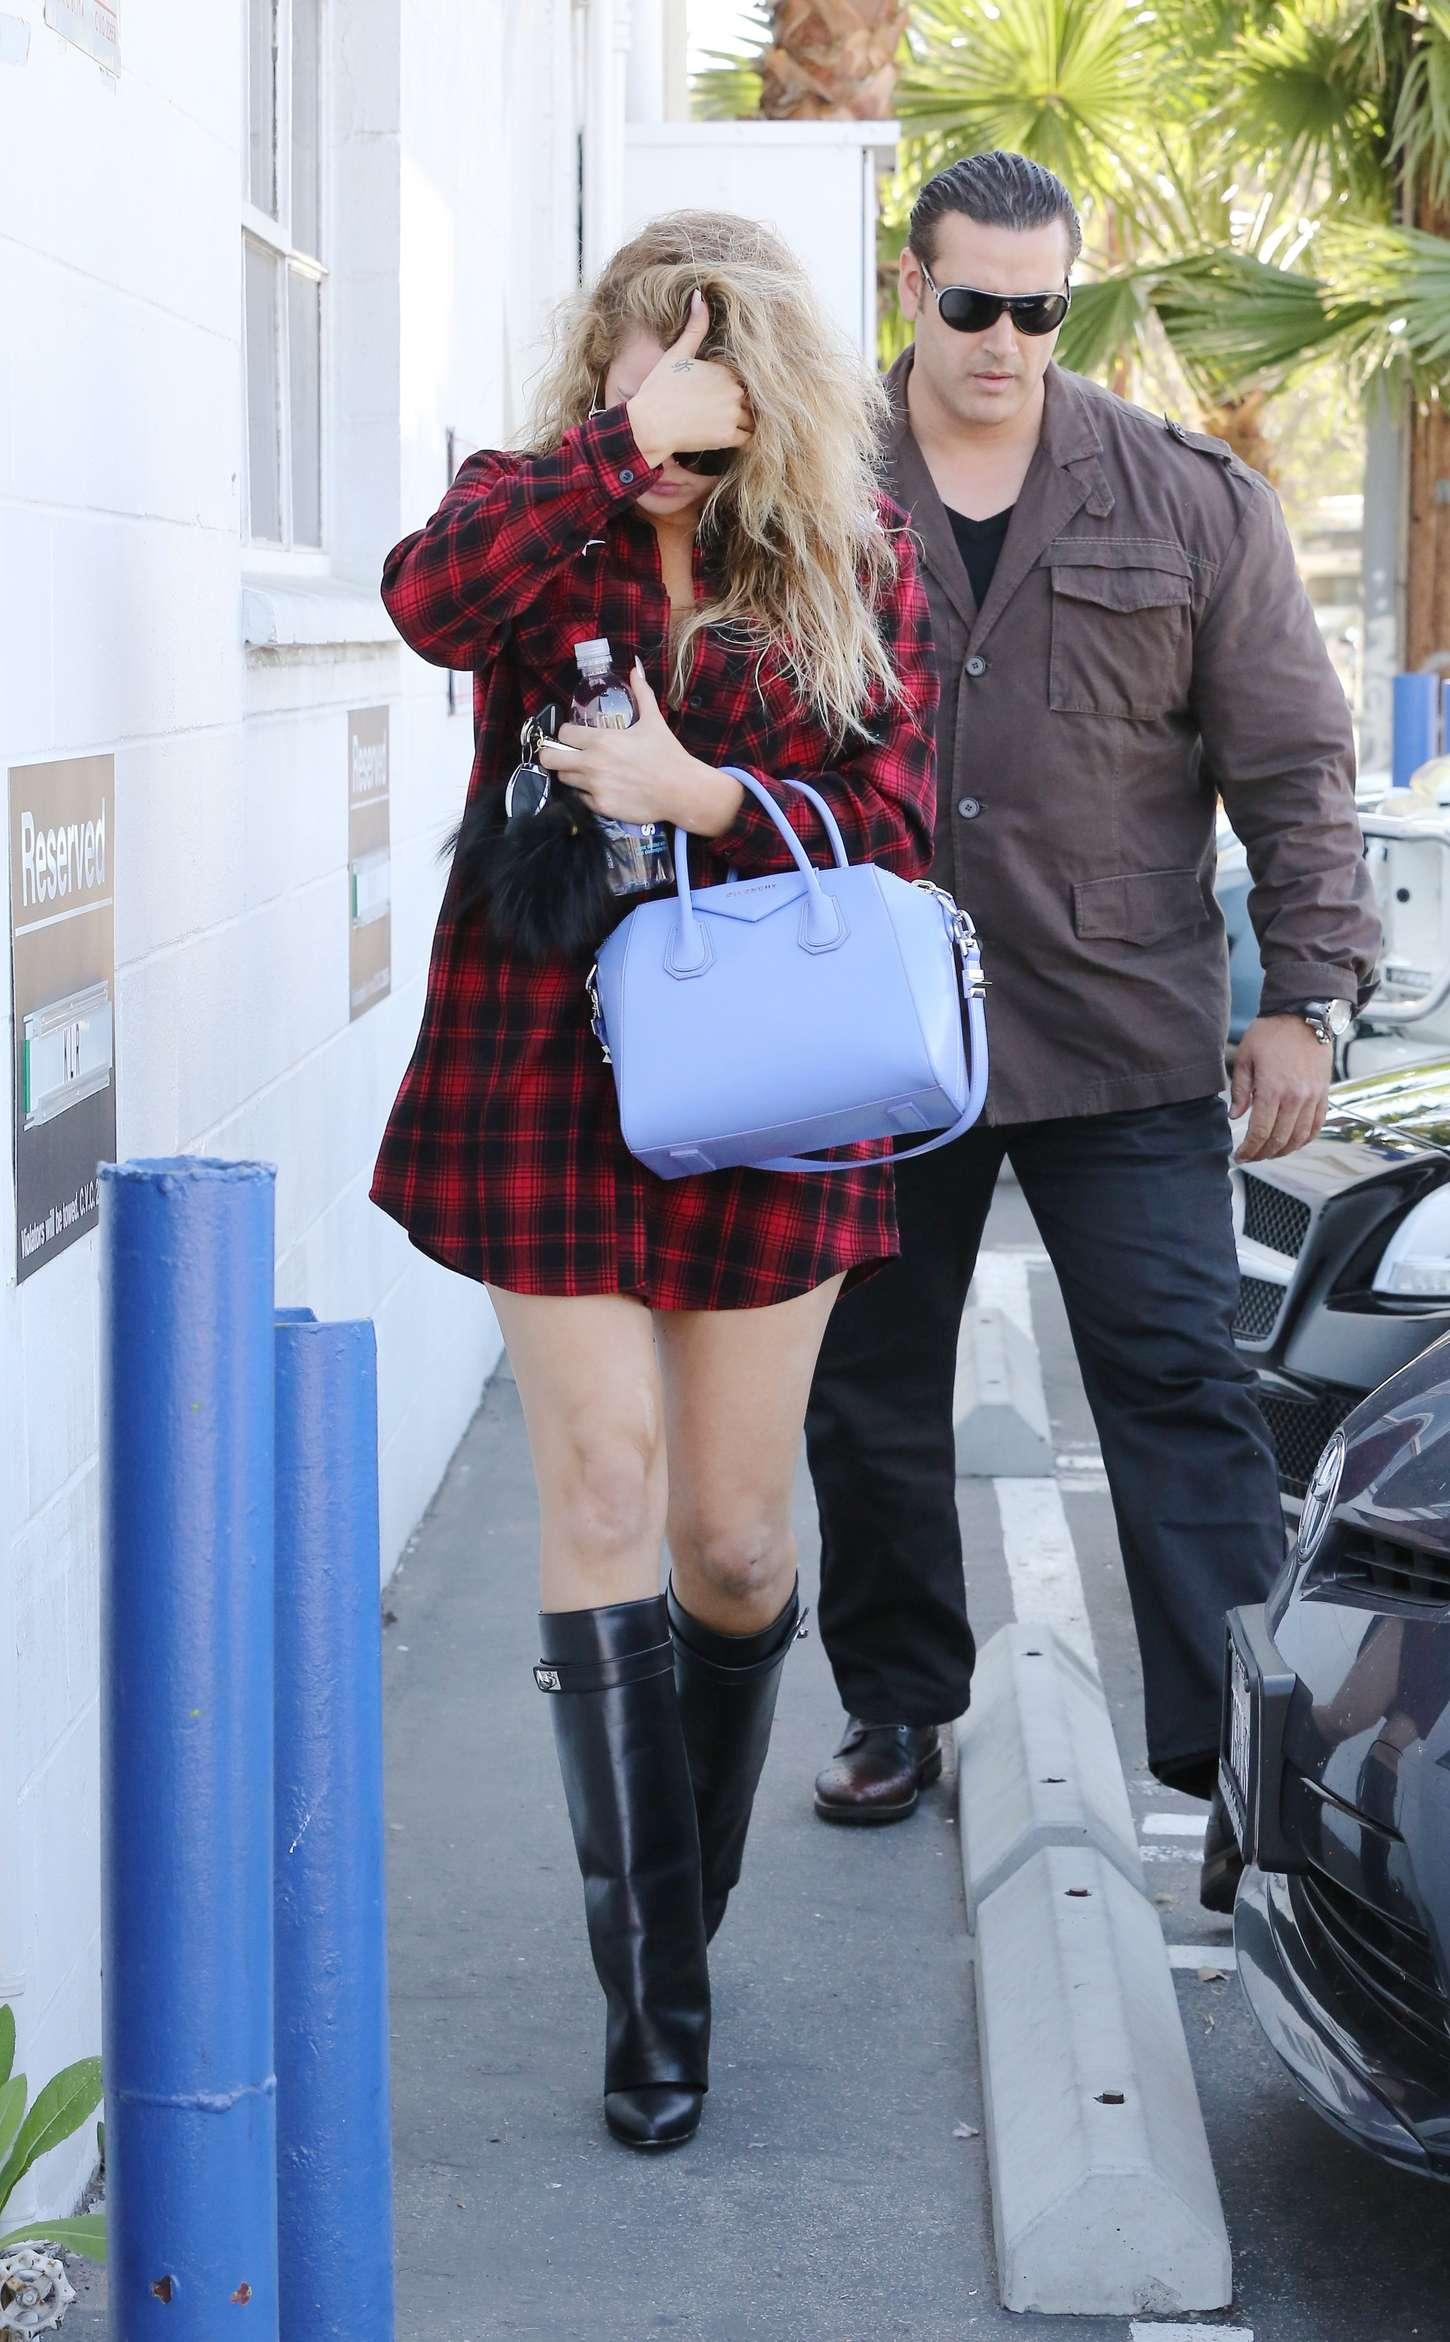 Khloe Kardashian 2015 : Khloe Kardashian in Red Shirt -11